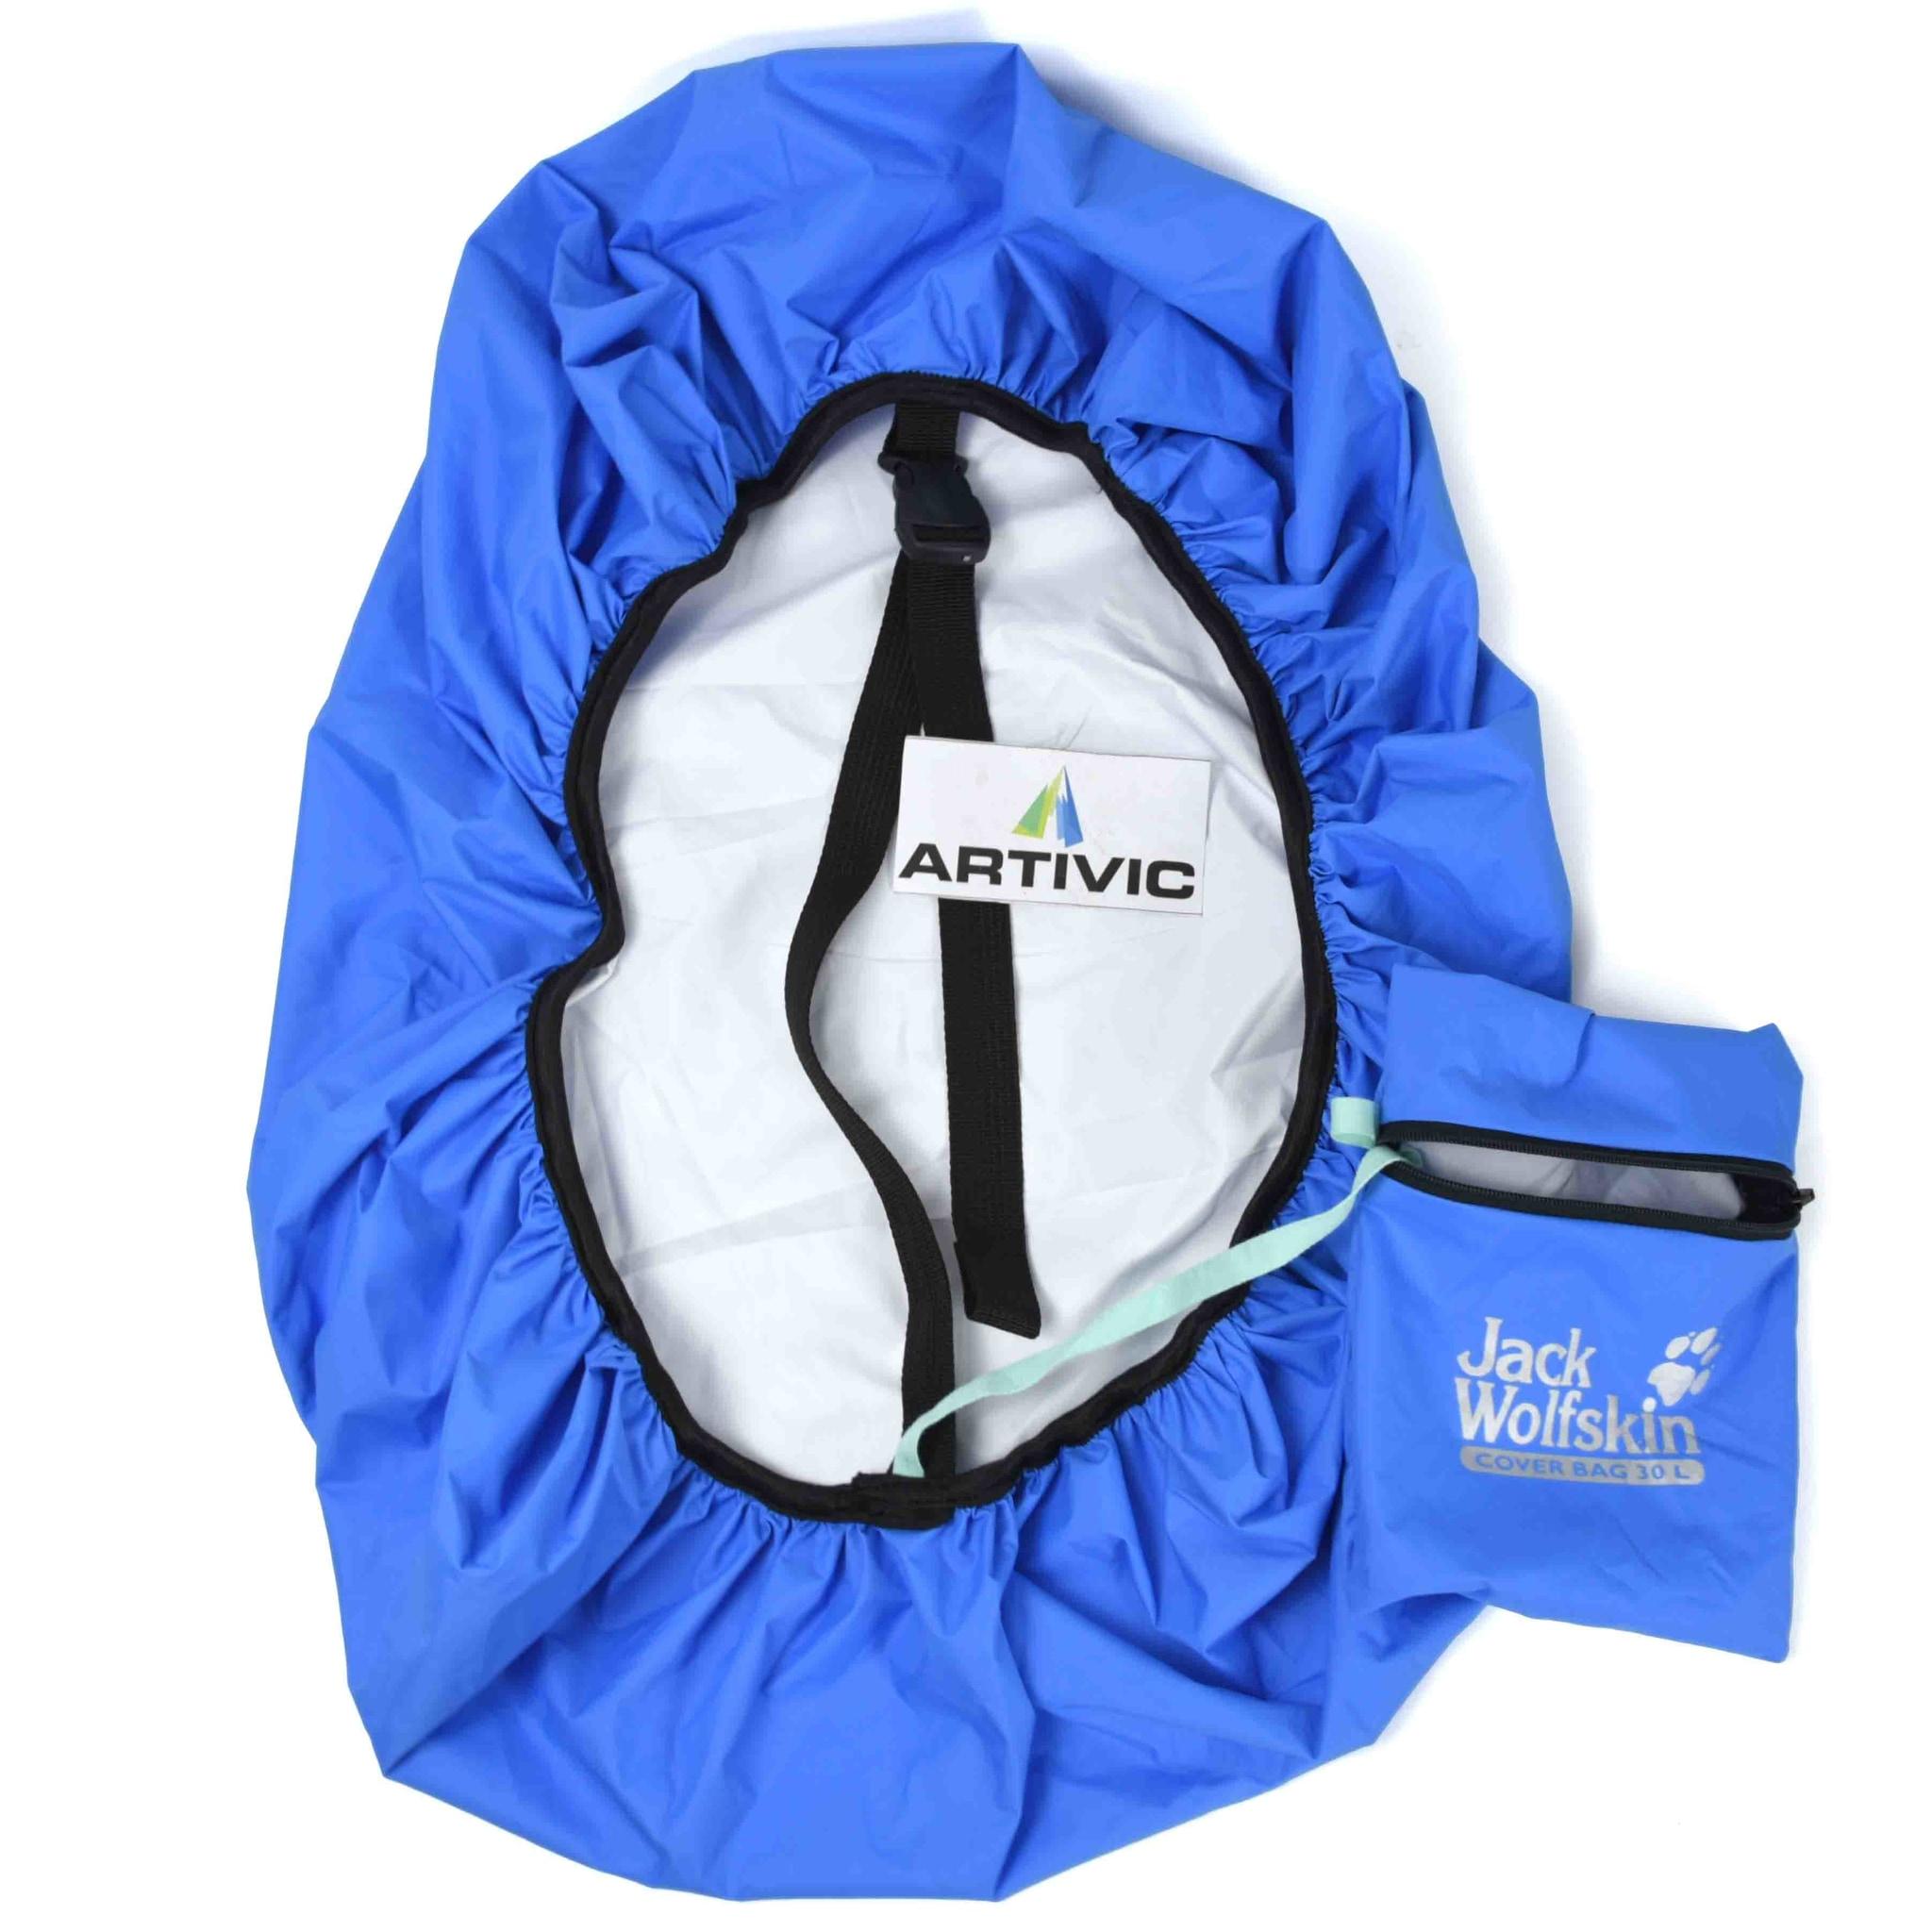 Consina 60 L Raincover Rain Cover Bag Coverbag Hitam Daftar Kamoro 30 35 Tas Daypack Jws Tnf 30l 35l Blanja